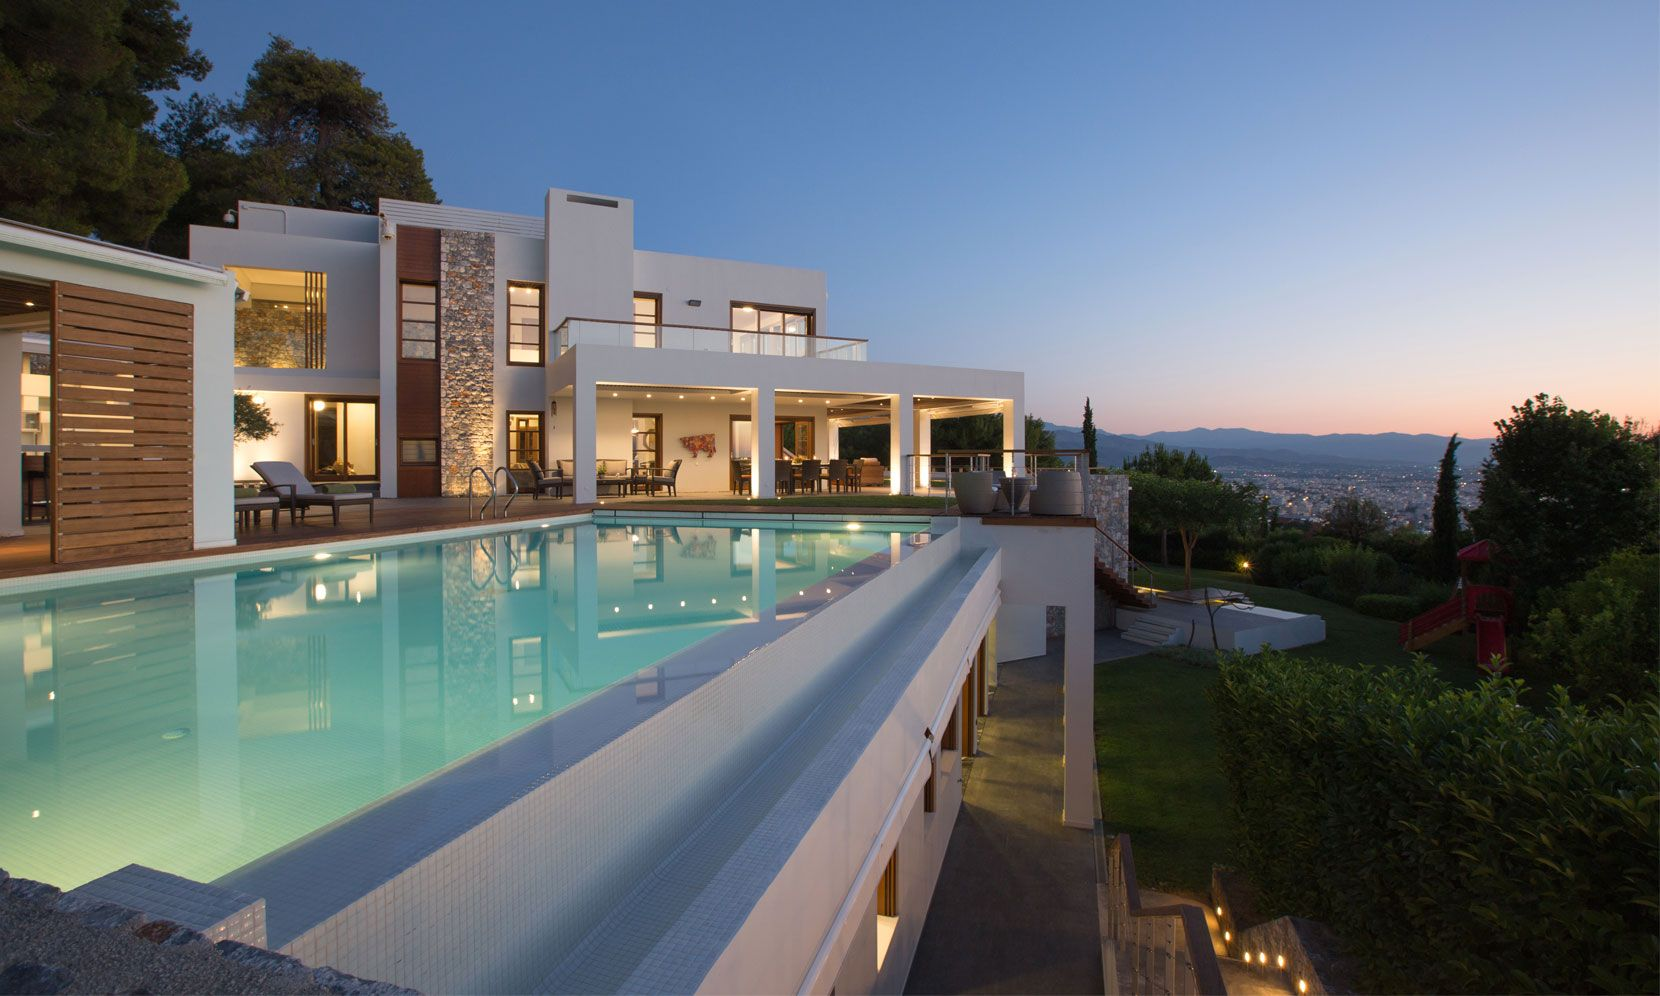 Crete Villa Lancea jumbotron image